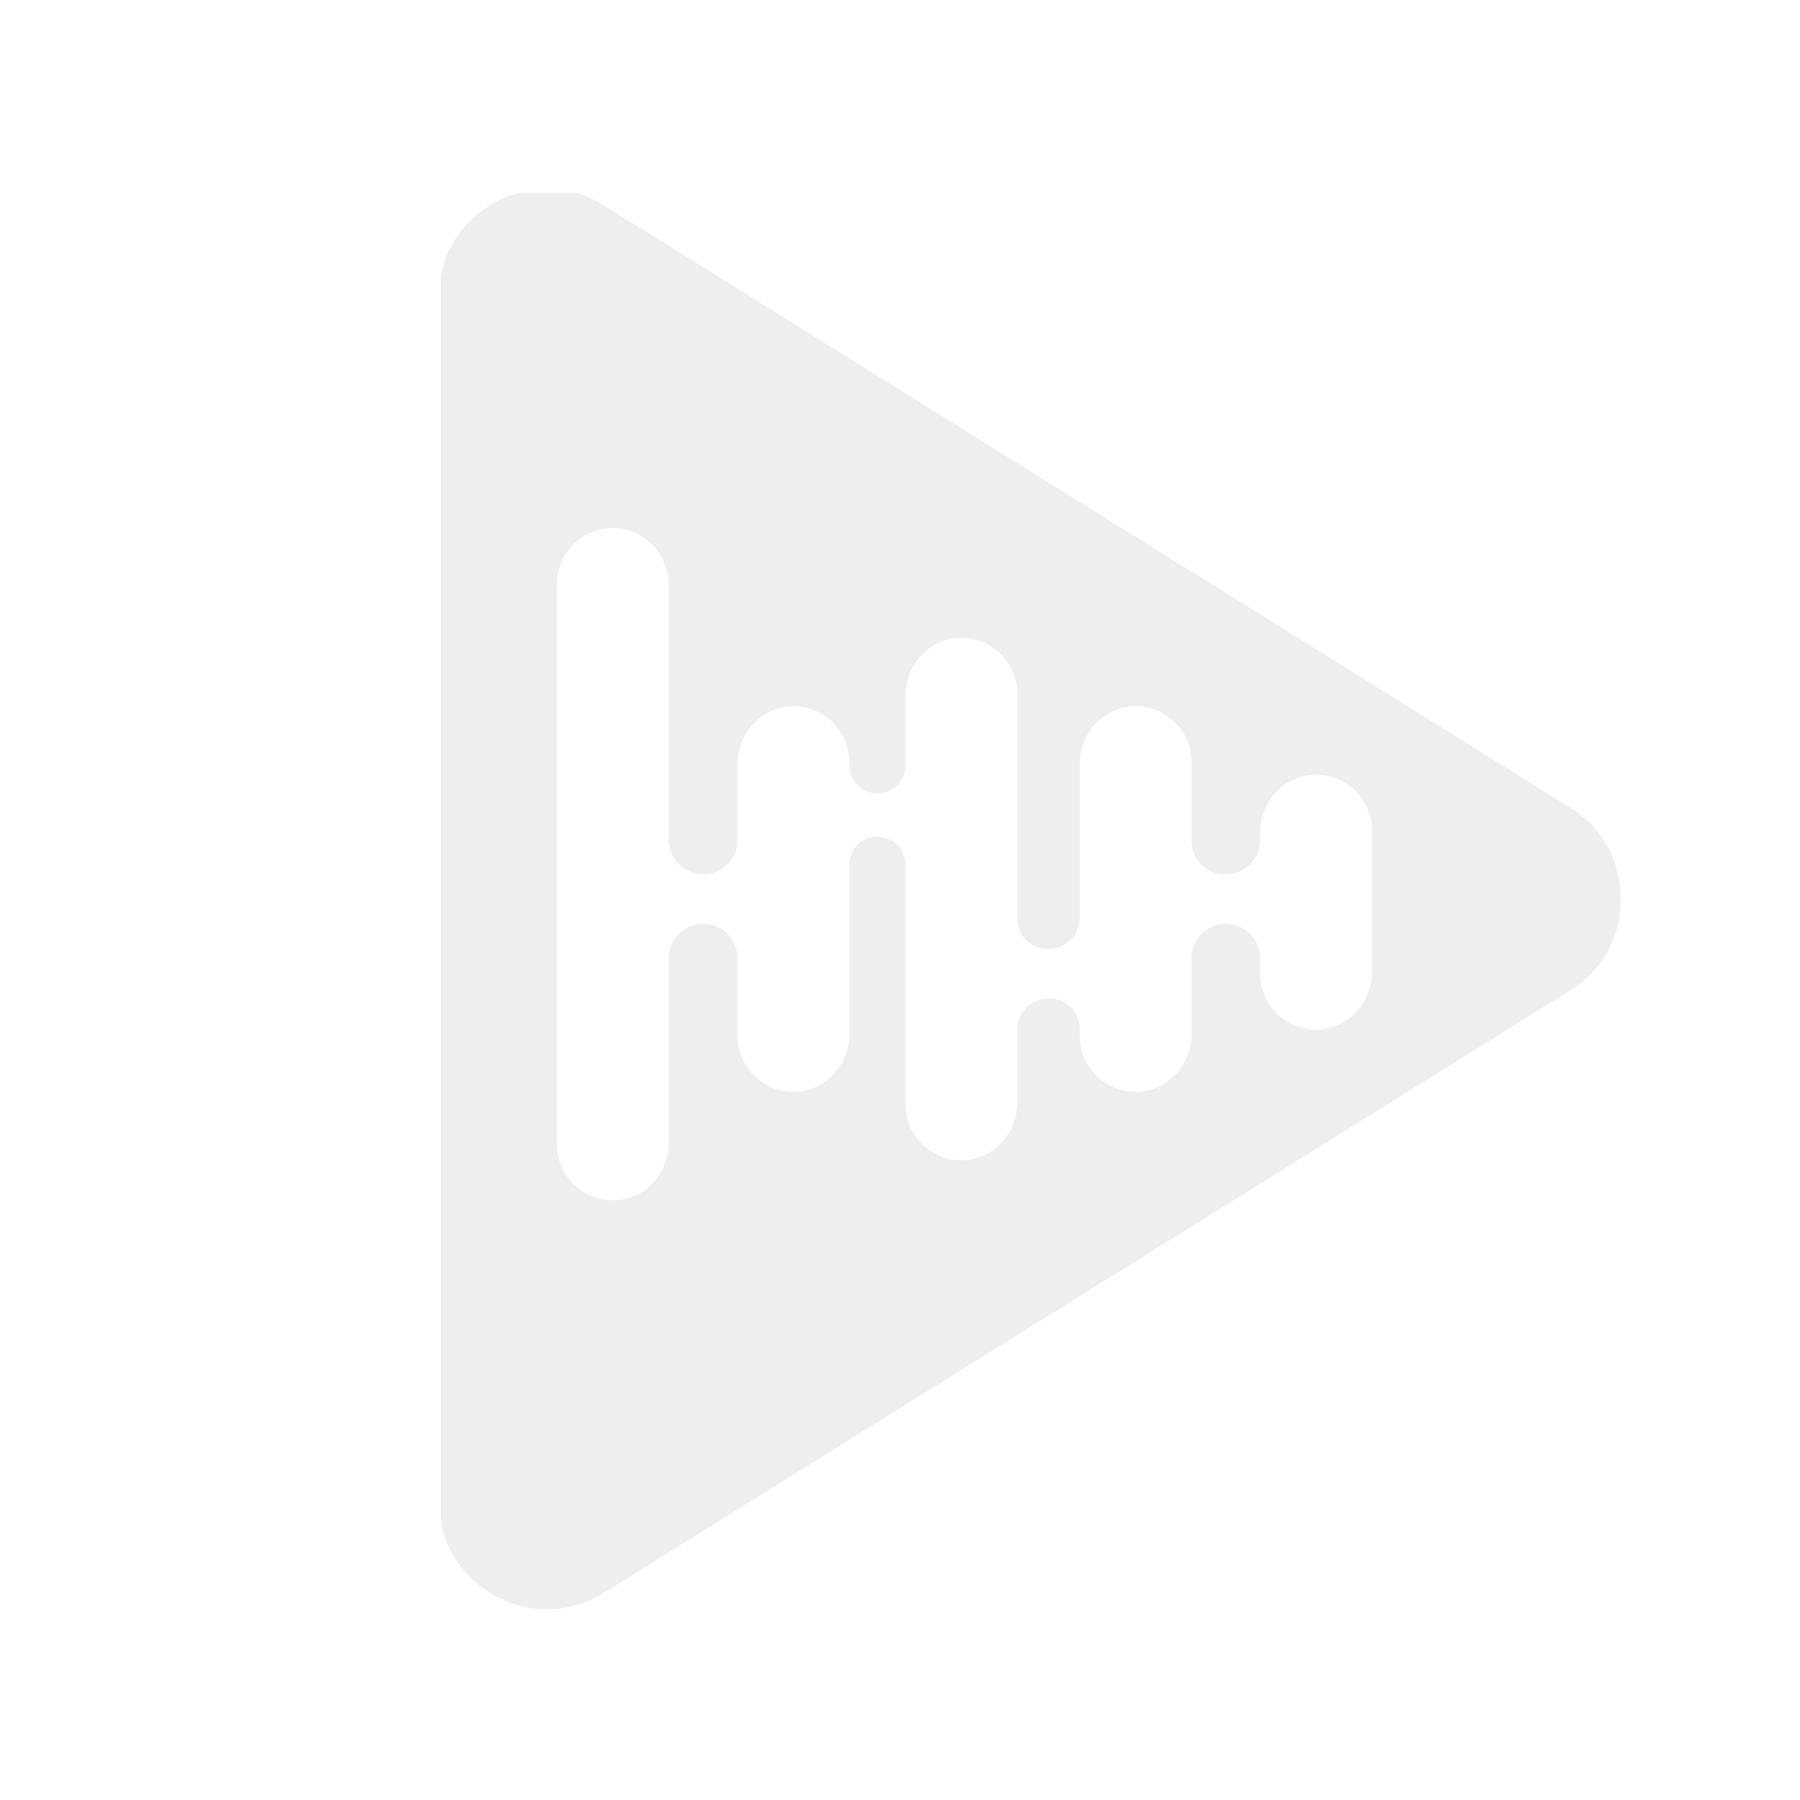 Metra 993009 - Radioadapter, 1-DIN, Chevrolet/Pontiac